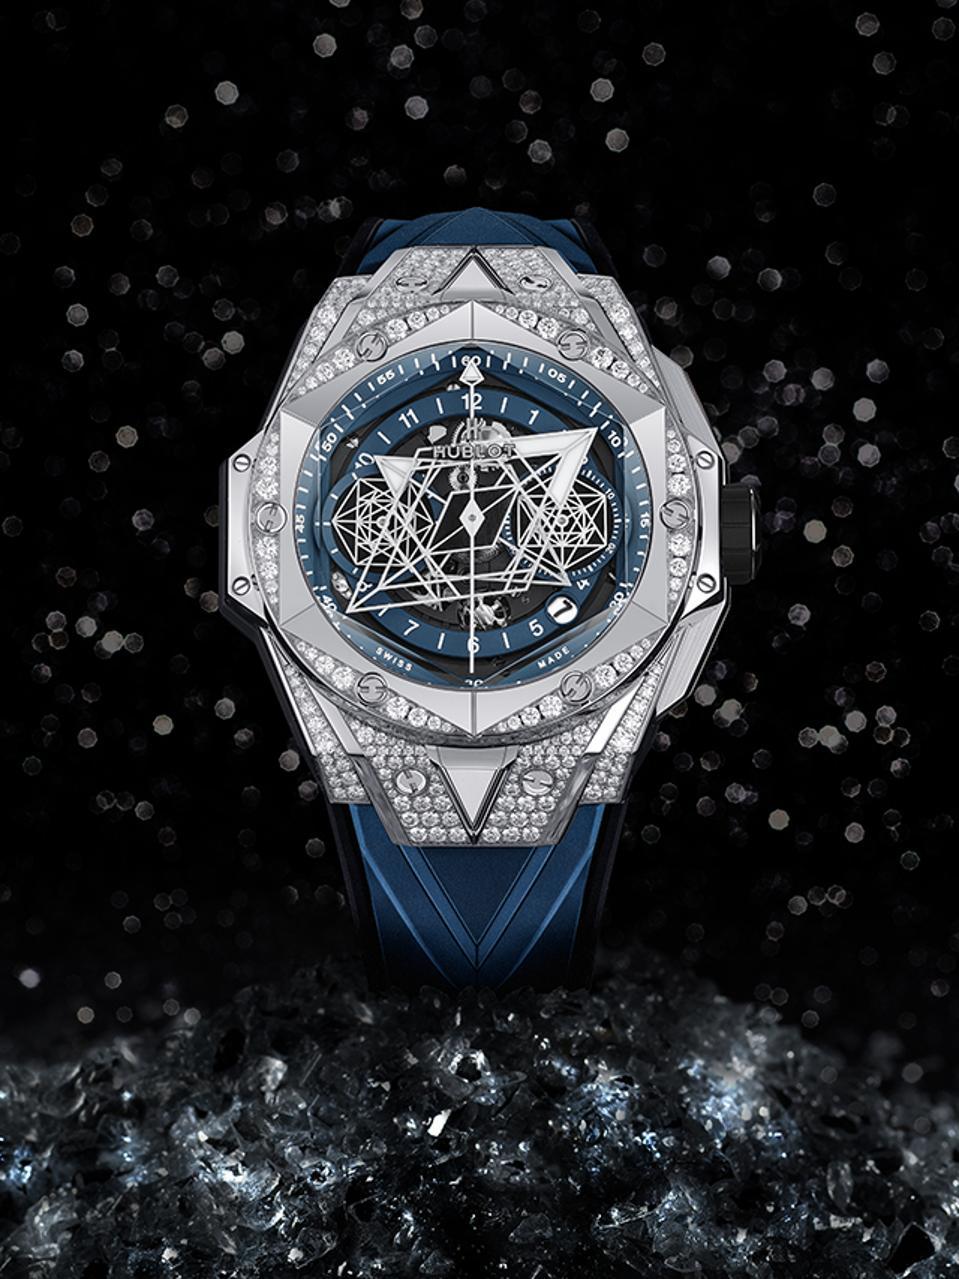 The Hublot Big Bang Sang Bleu II.